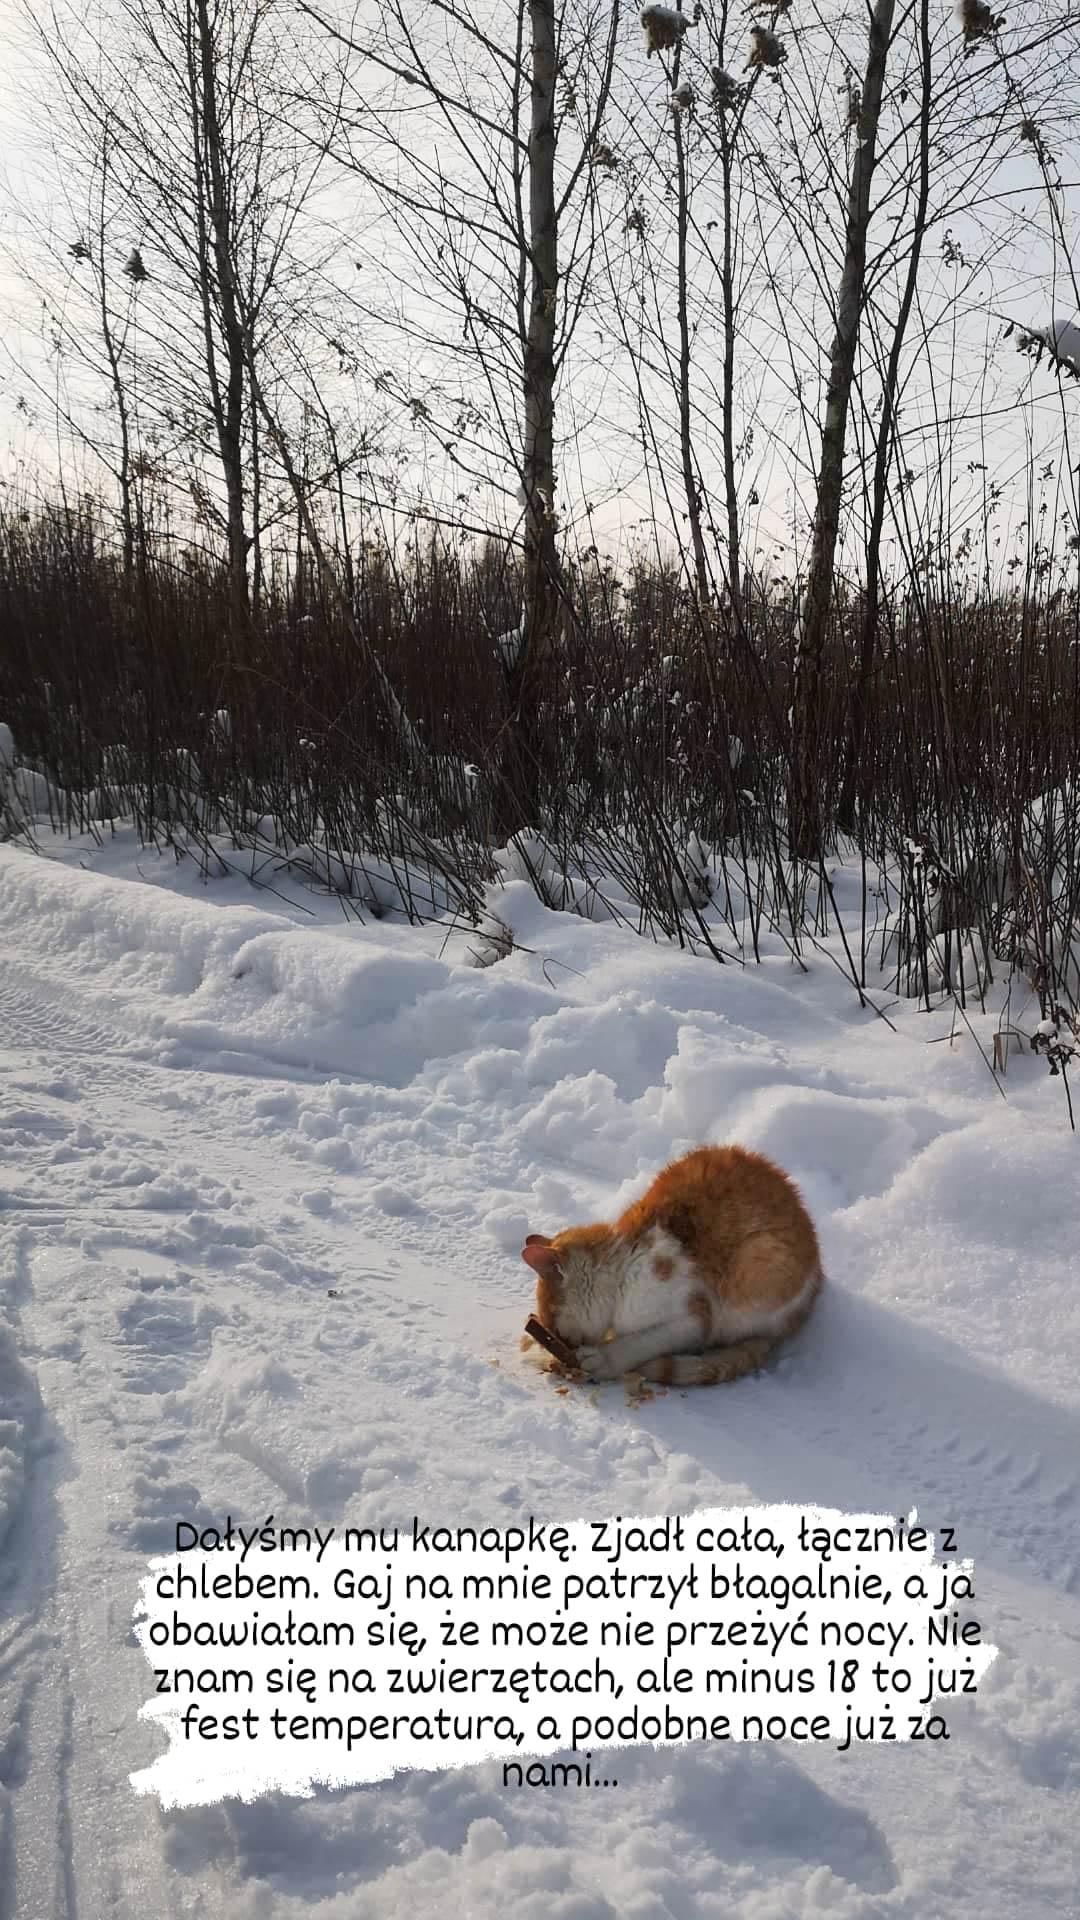 Znalazłam kota